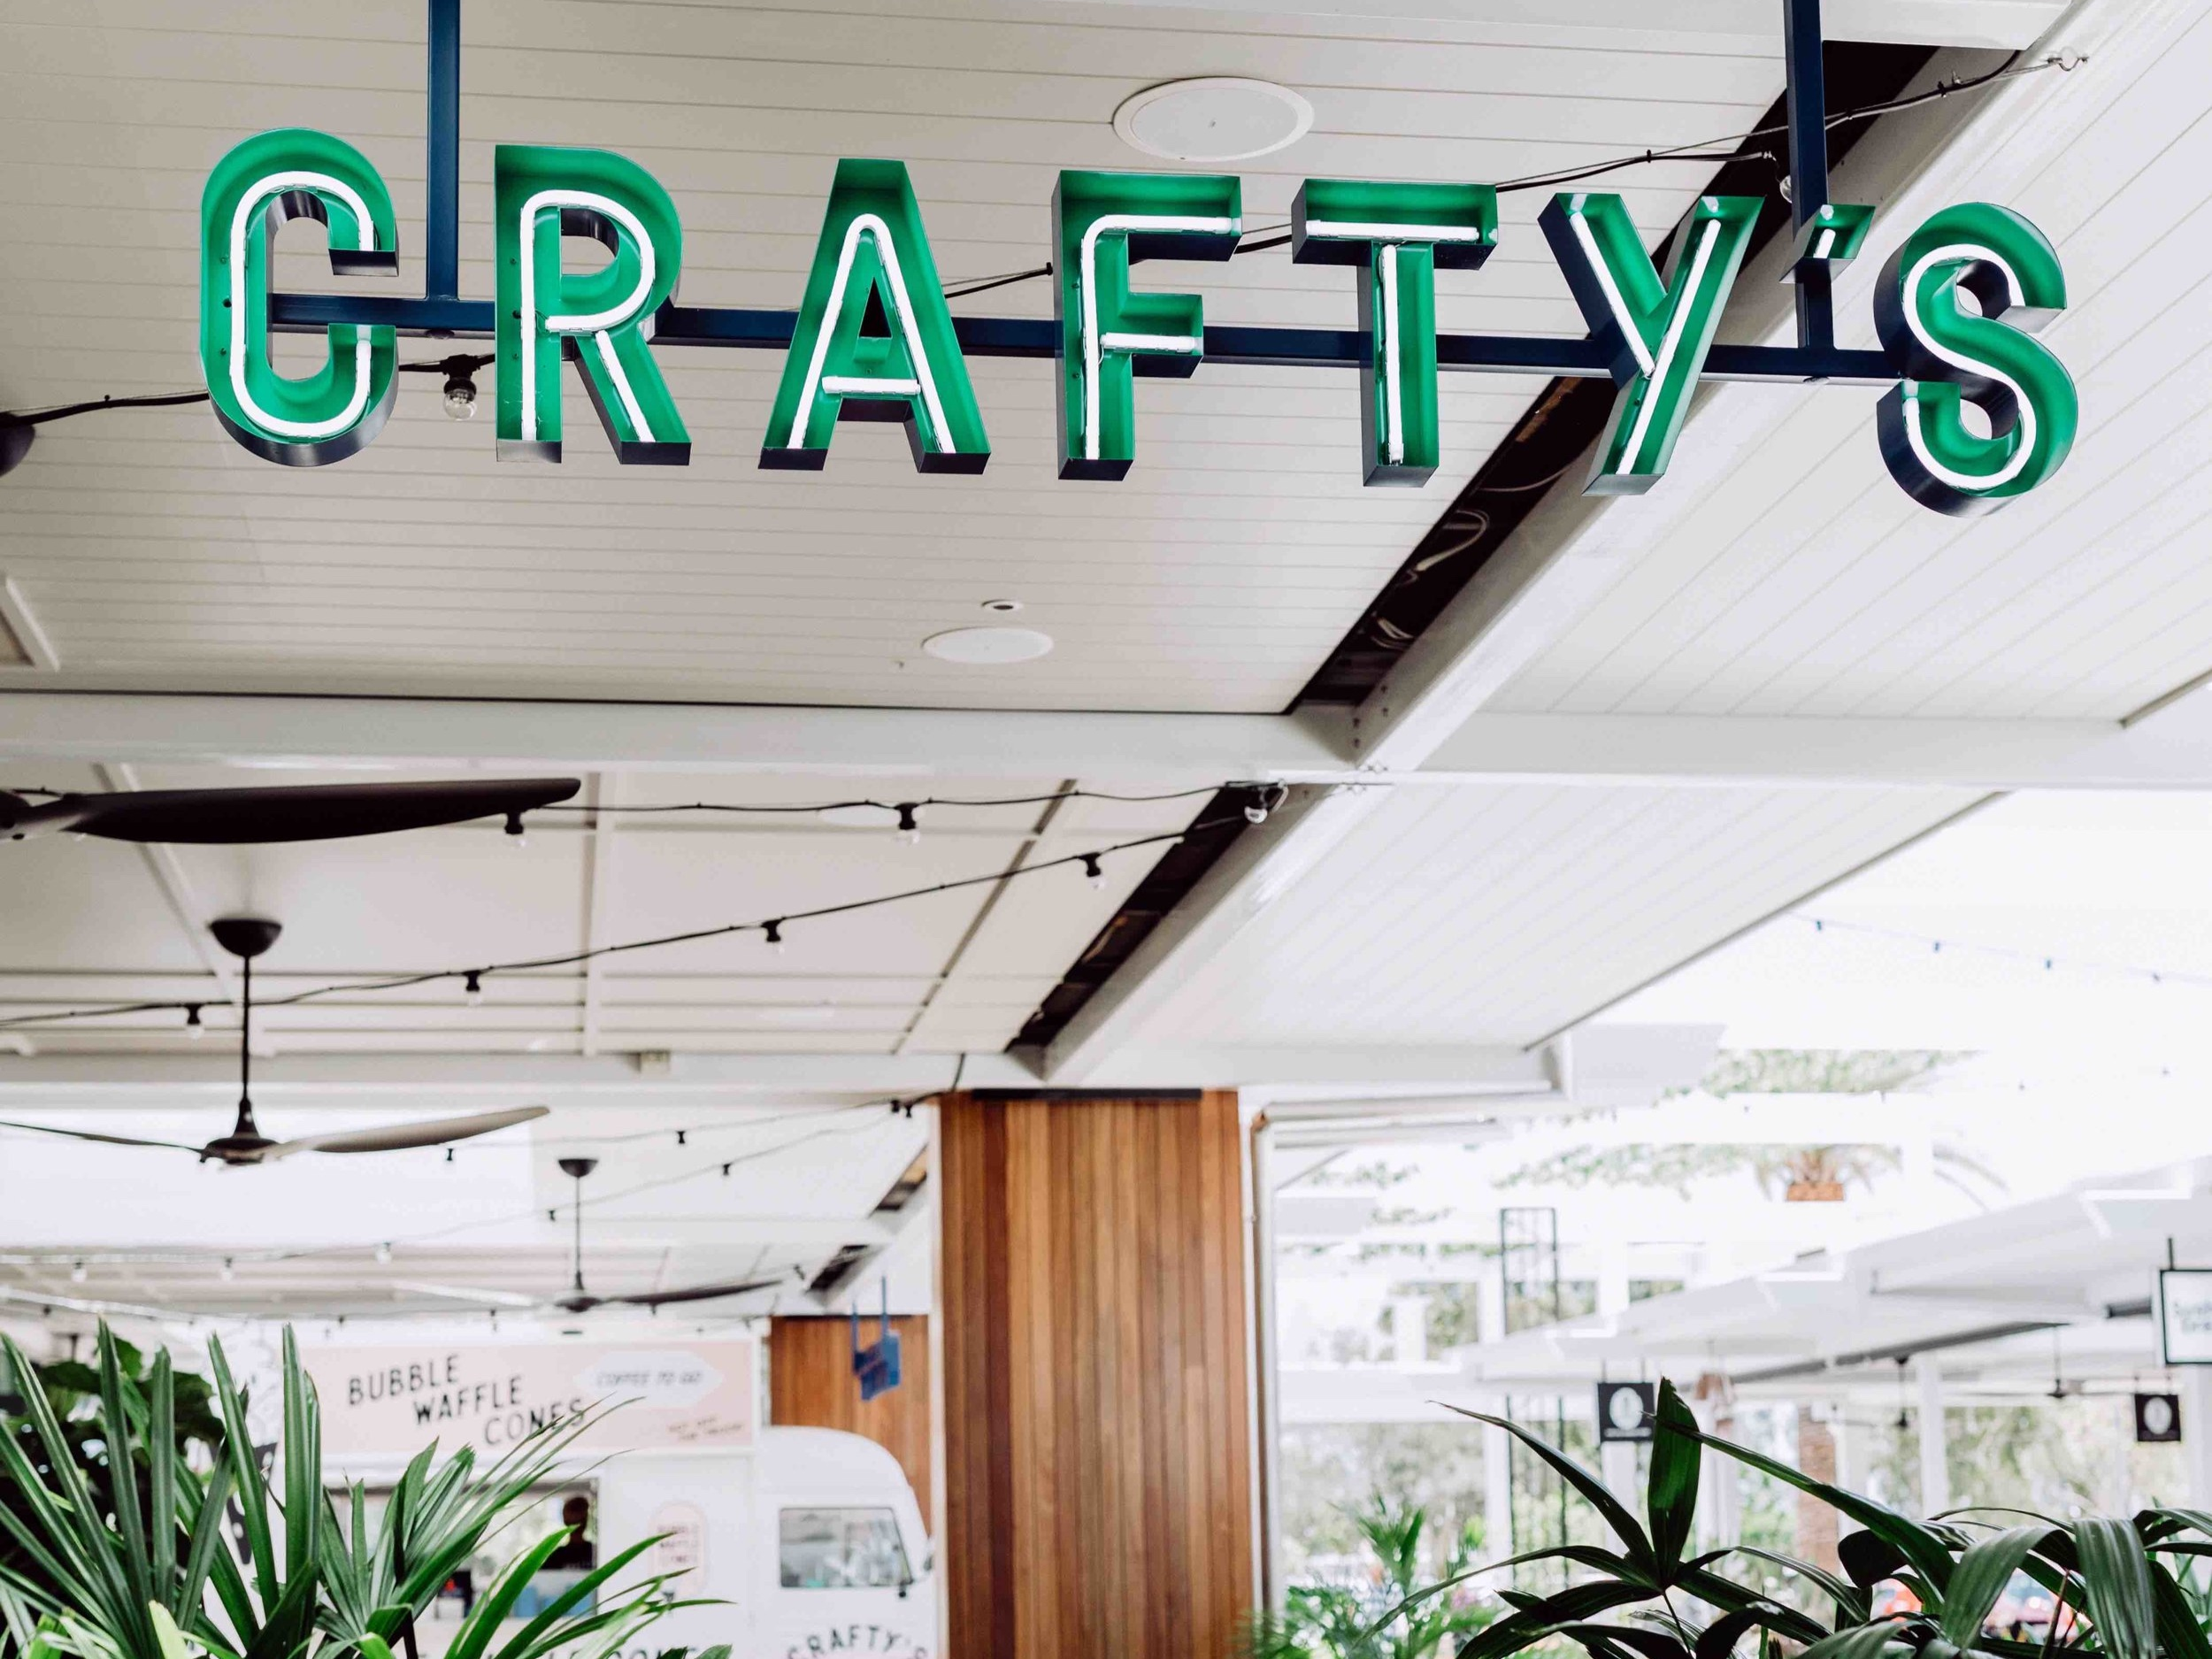 Craftys-90.jpg